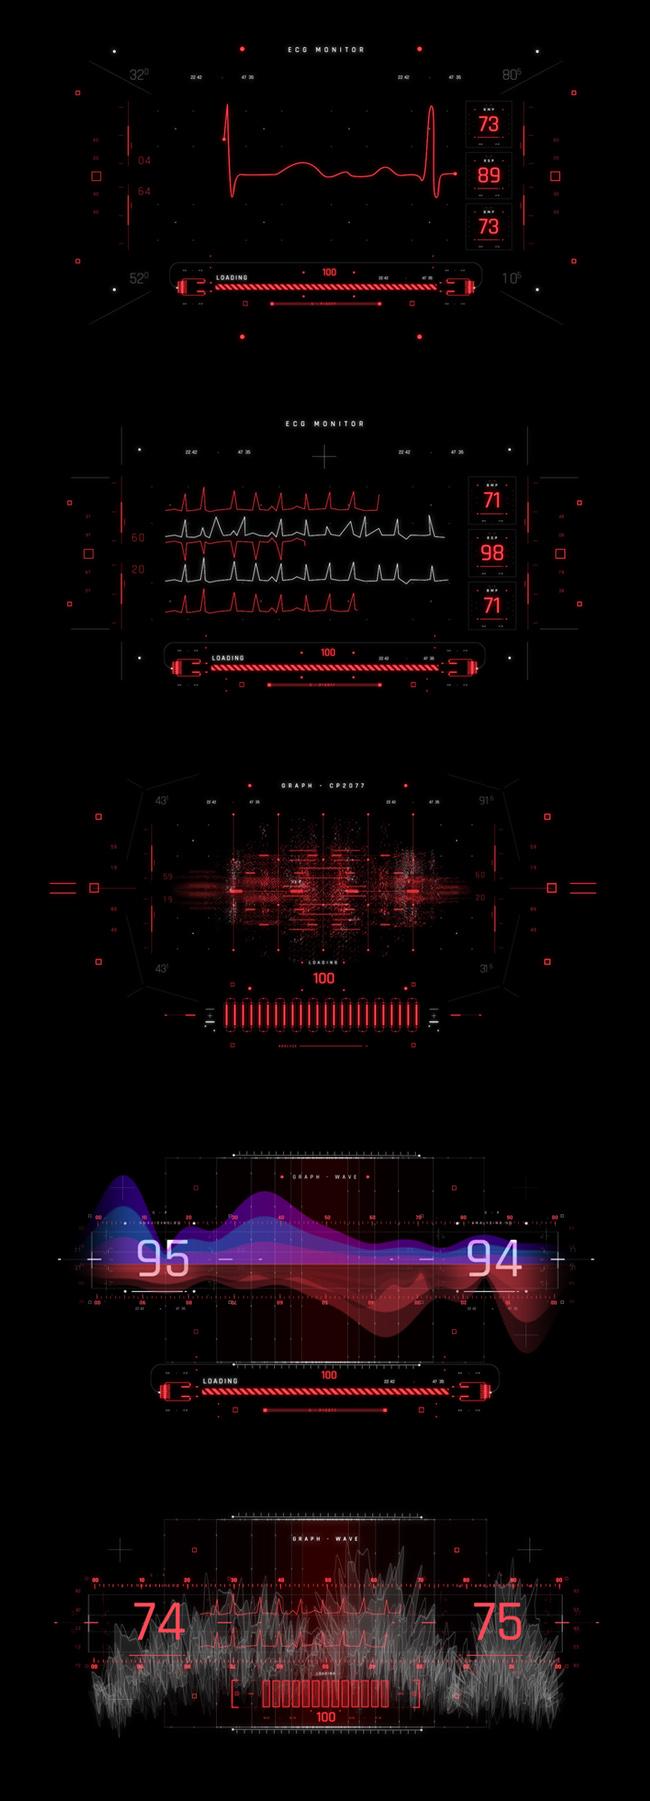 AE脚本-500个HUD高科技赛博朋克UI科幻界面元素动画预设包 Cyberpunk HUD UI 500+ 已修复中文版AE表达式报错插图26